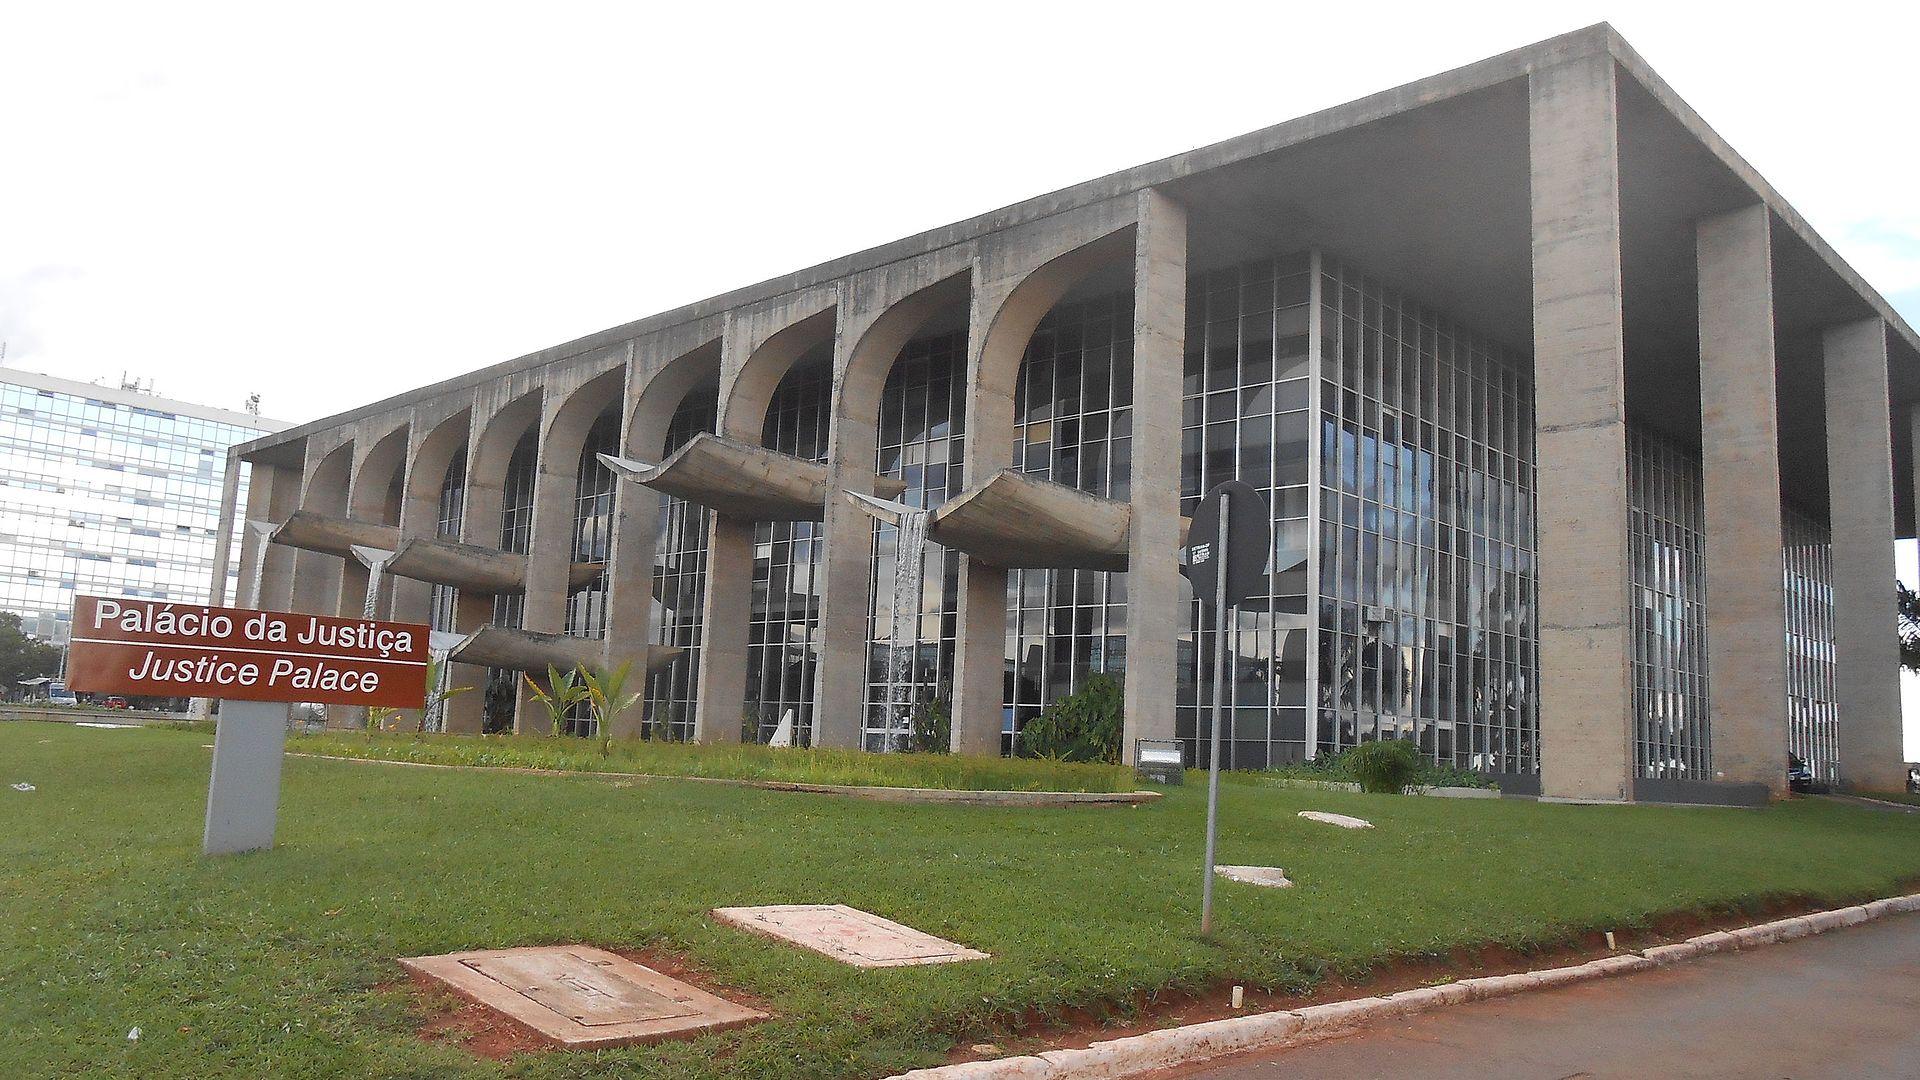 Palácio_da_Justiça_em_Brasília.JPG